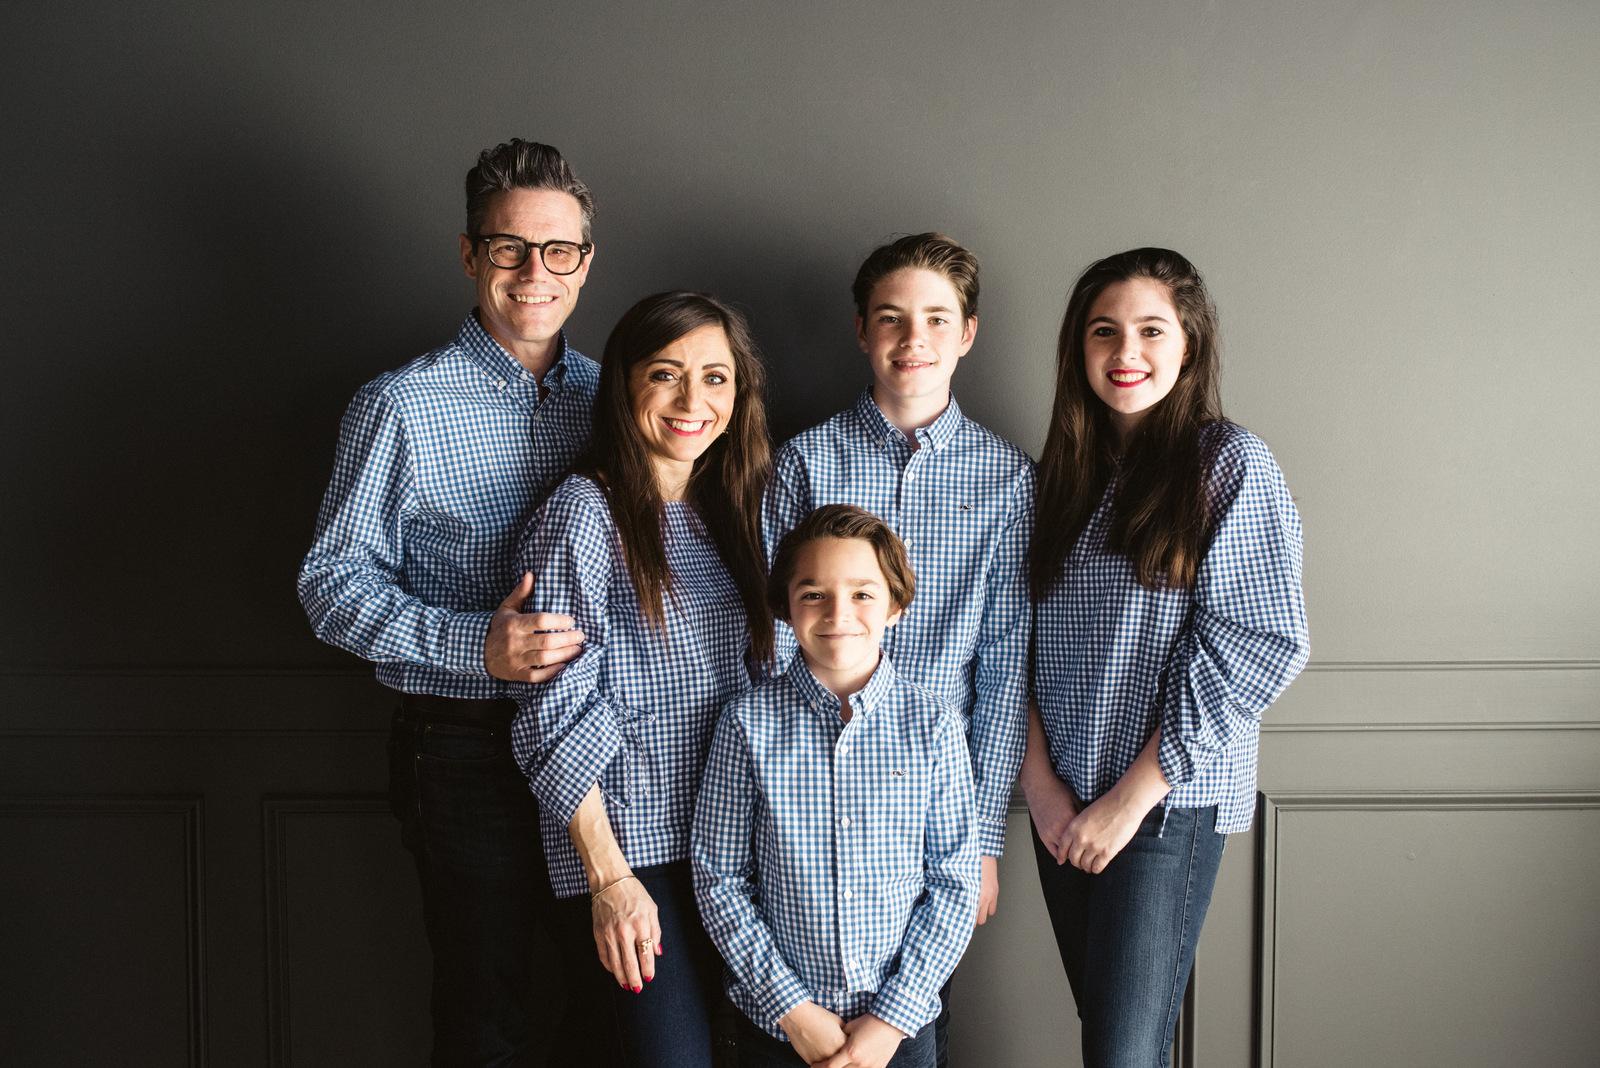 Family Easter Photos | House of Valentina-4.jpg